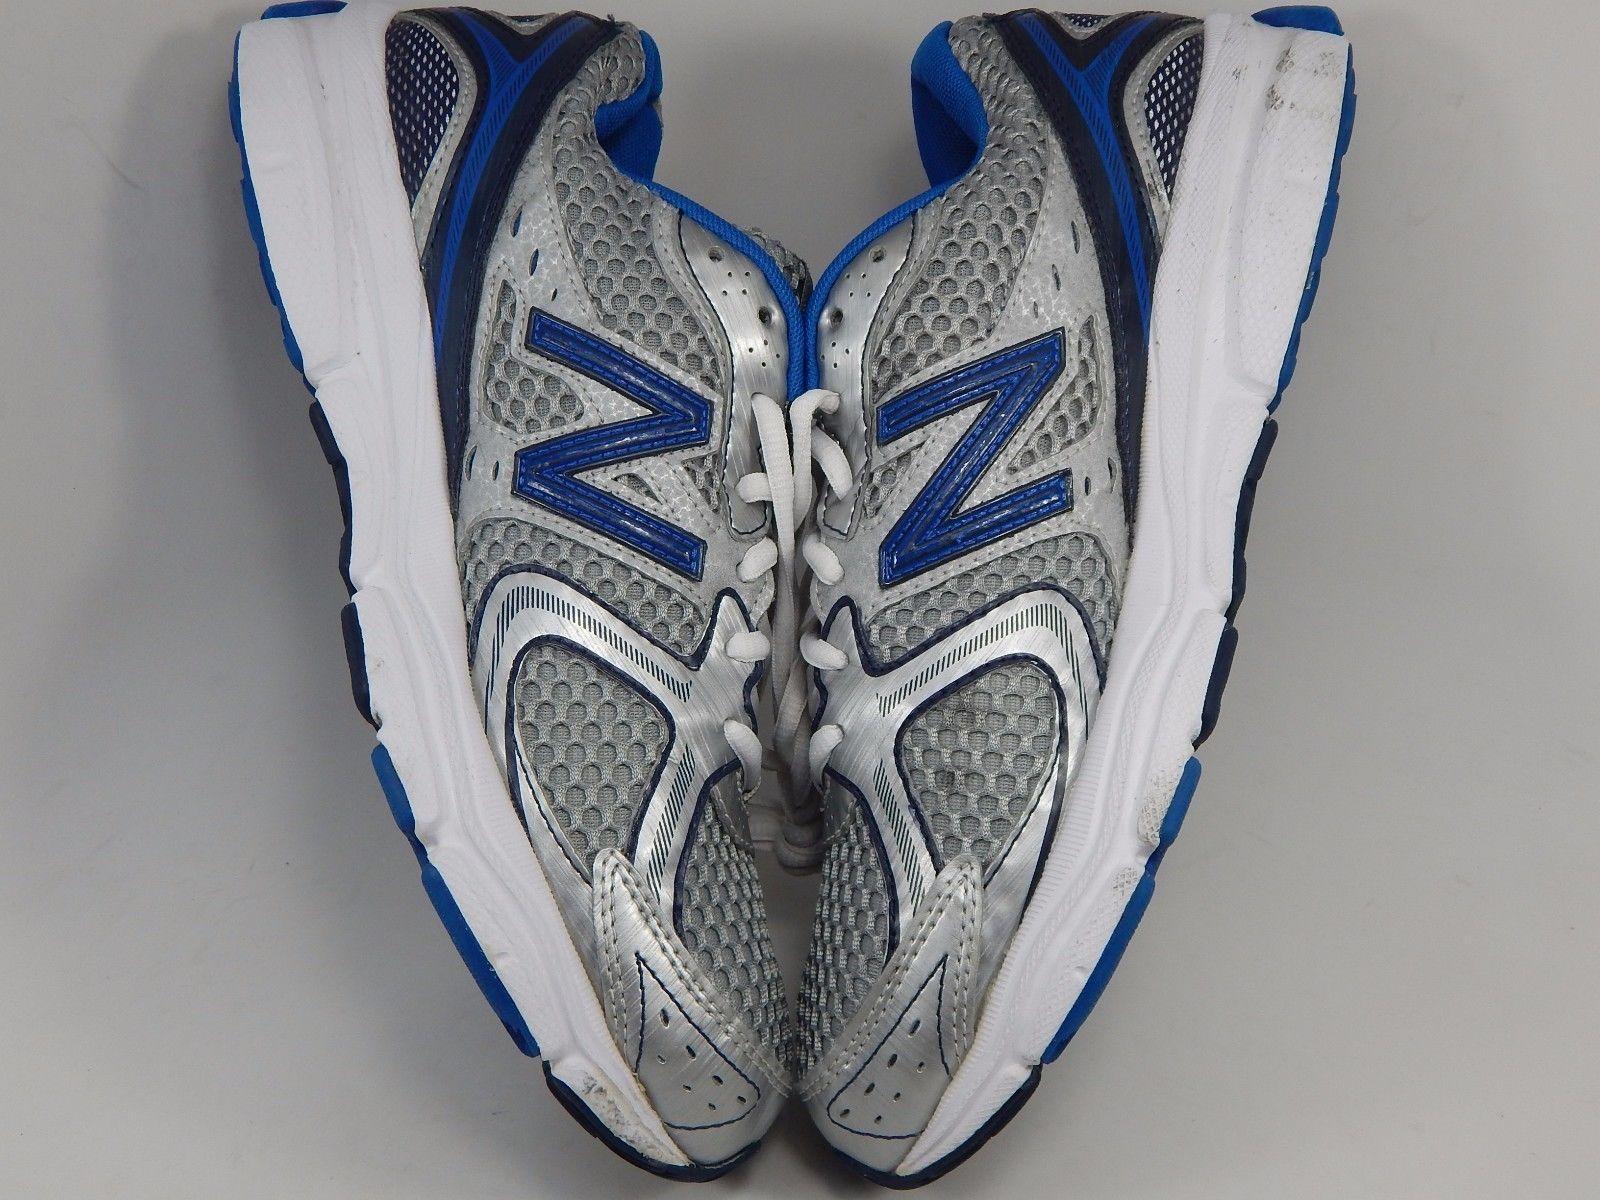 New Balance 580 v2 Men's Running Shoes Size US 9.5 M (D) EU 43 Silver M580SB2